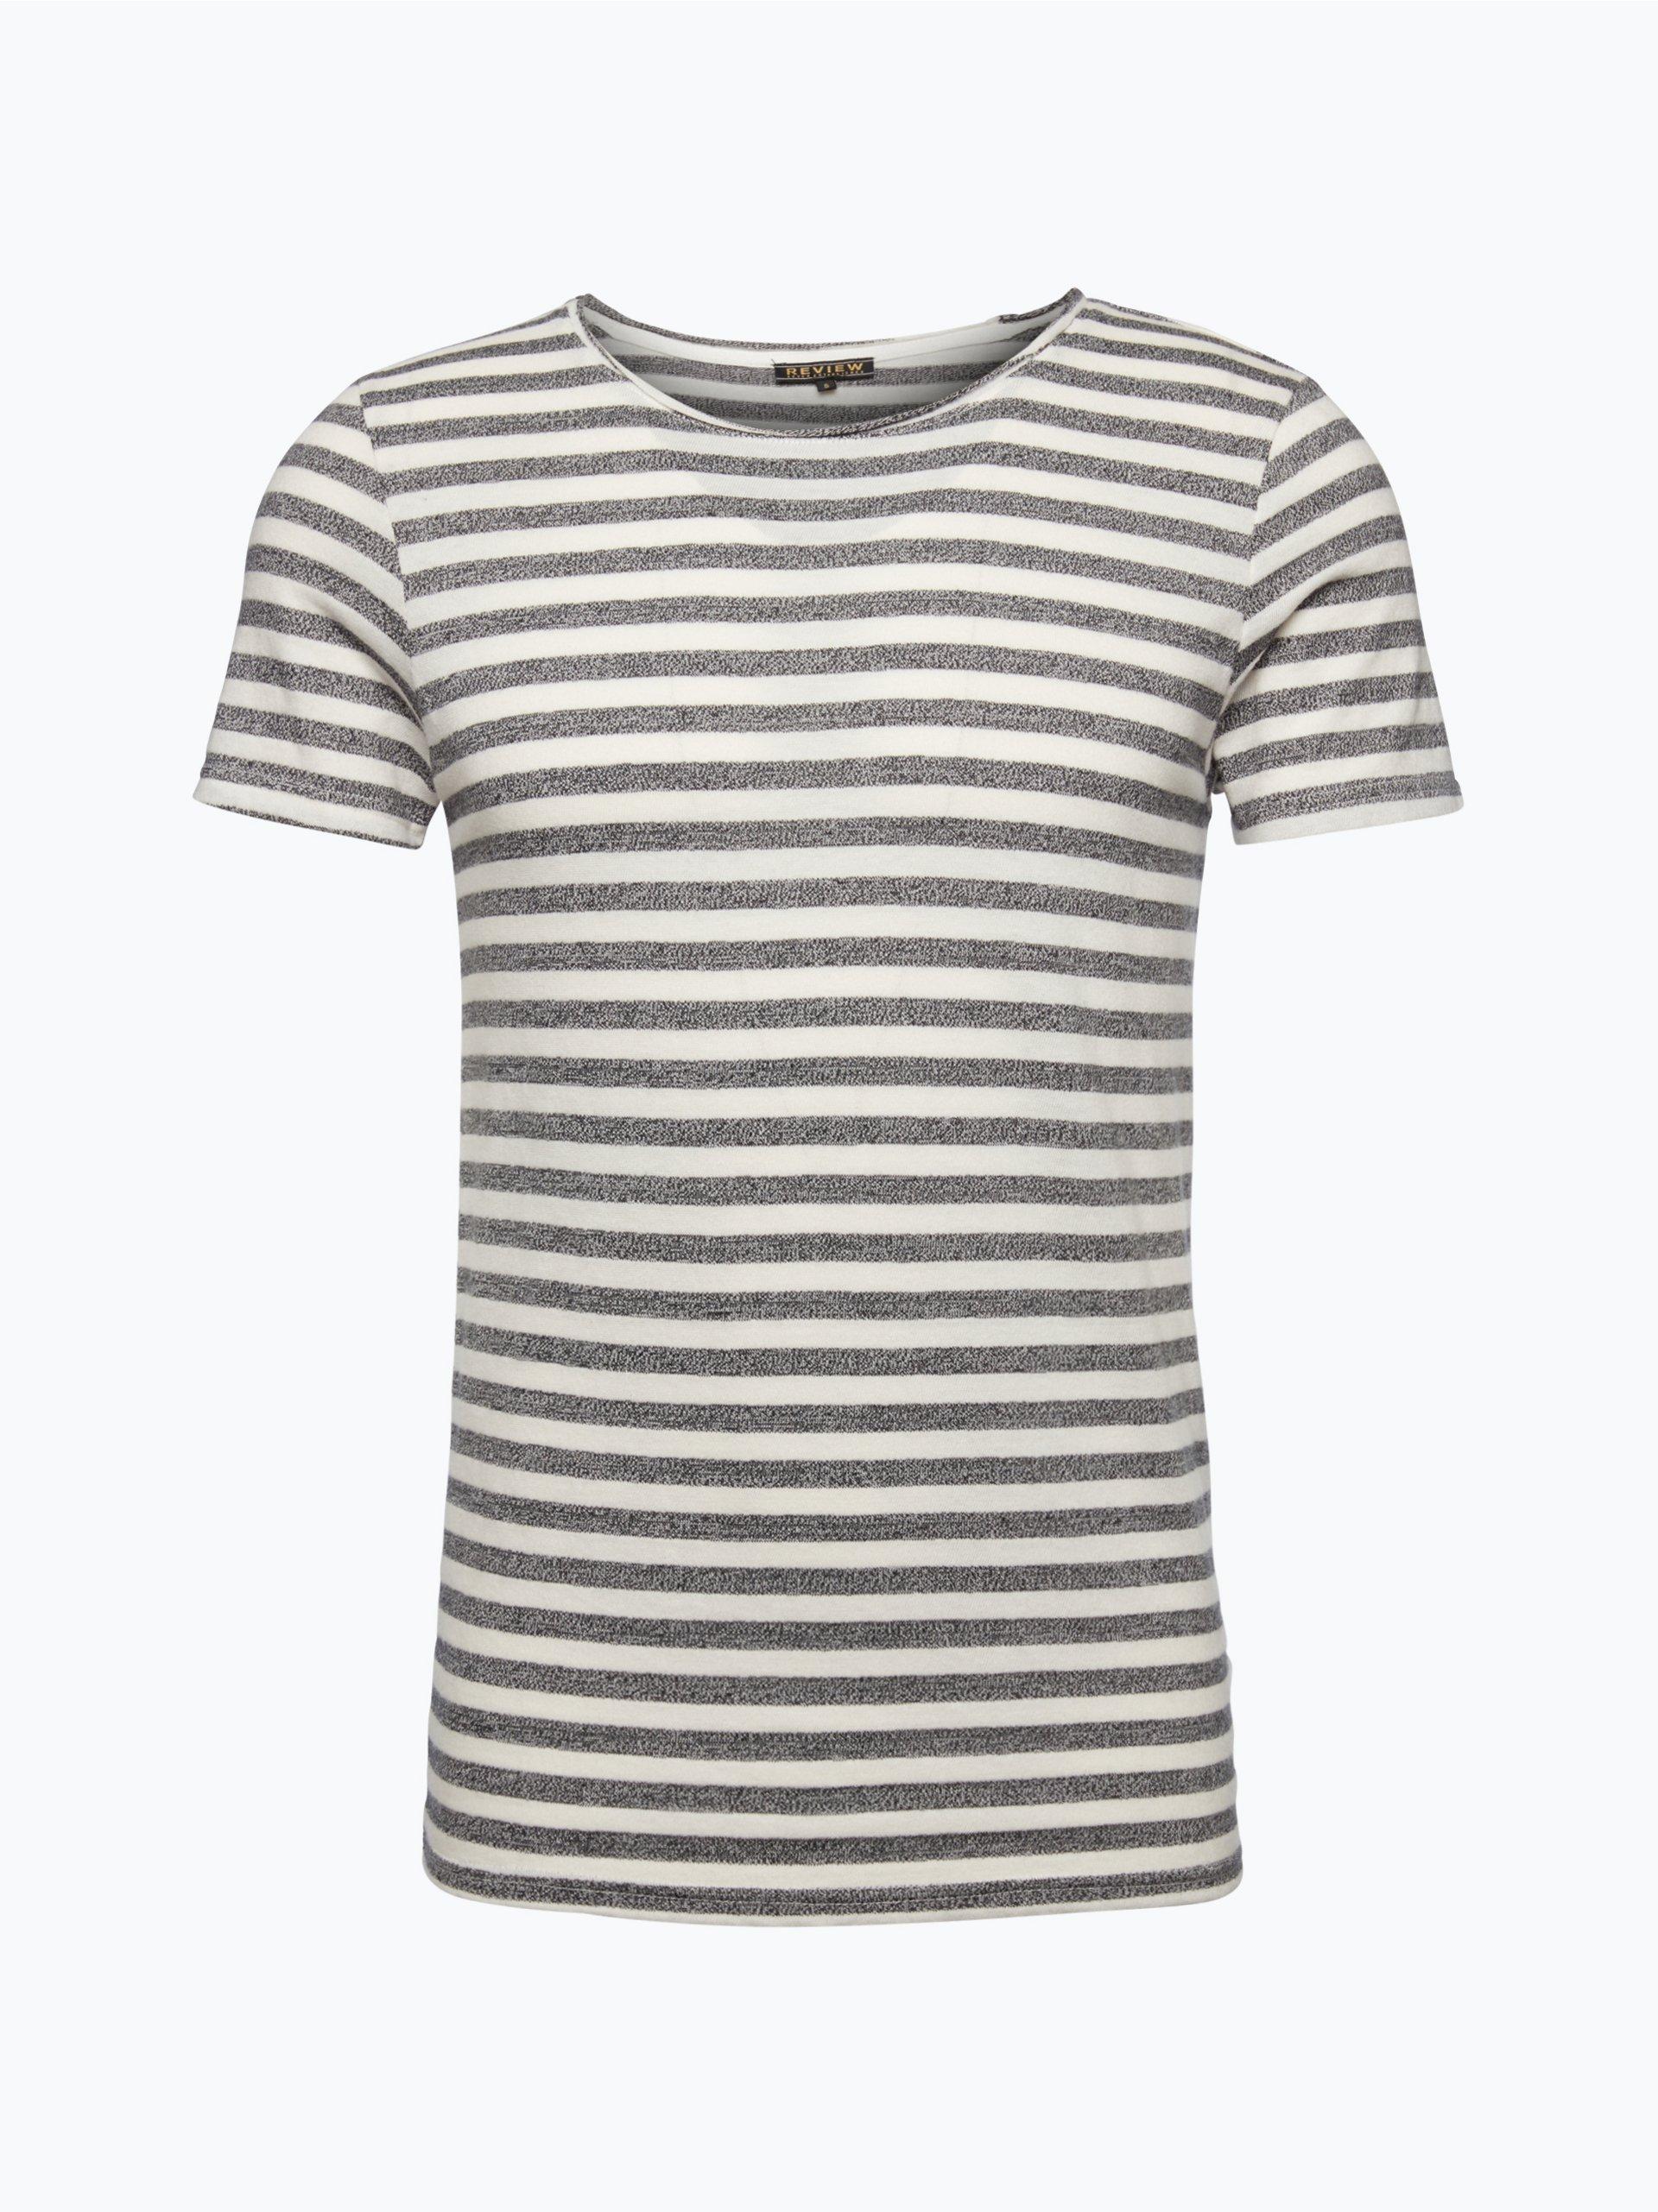 review herren t shirt schwarz gestreift online kaufen. Black Bedroom Furniture Sets. Home Design Ideas